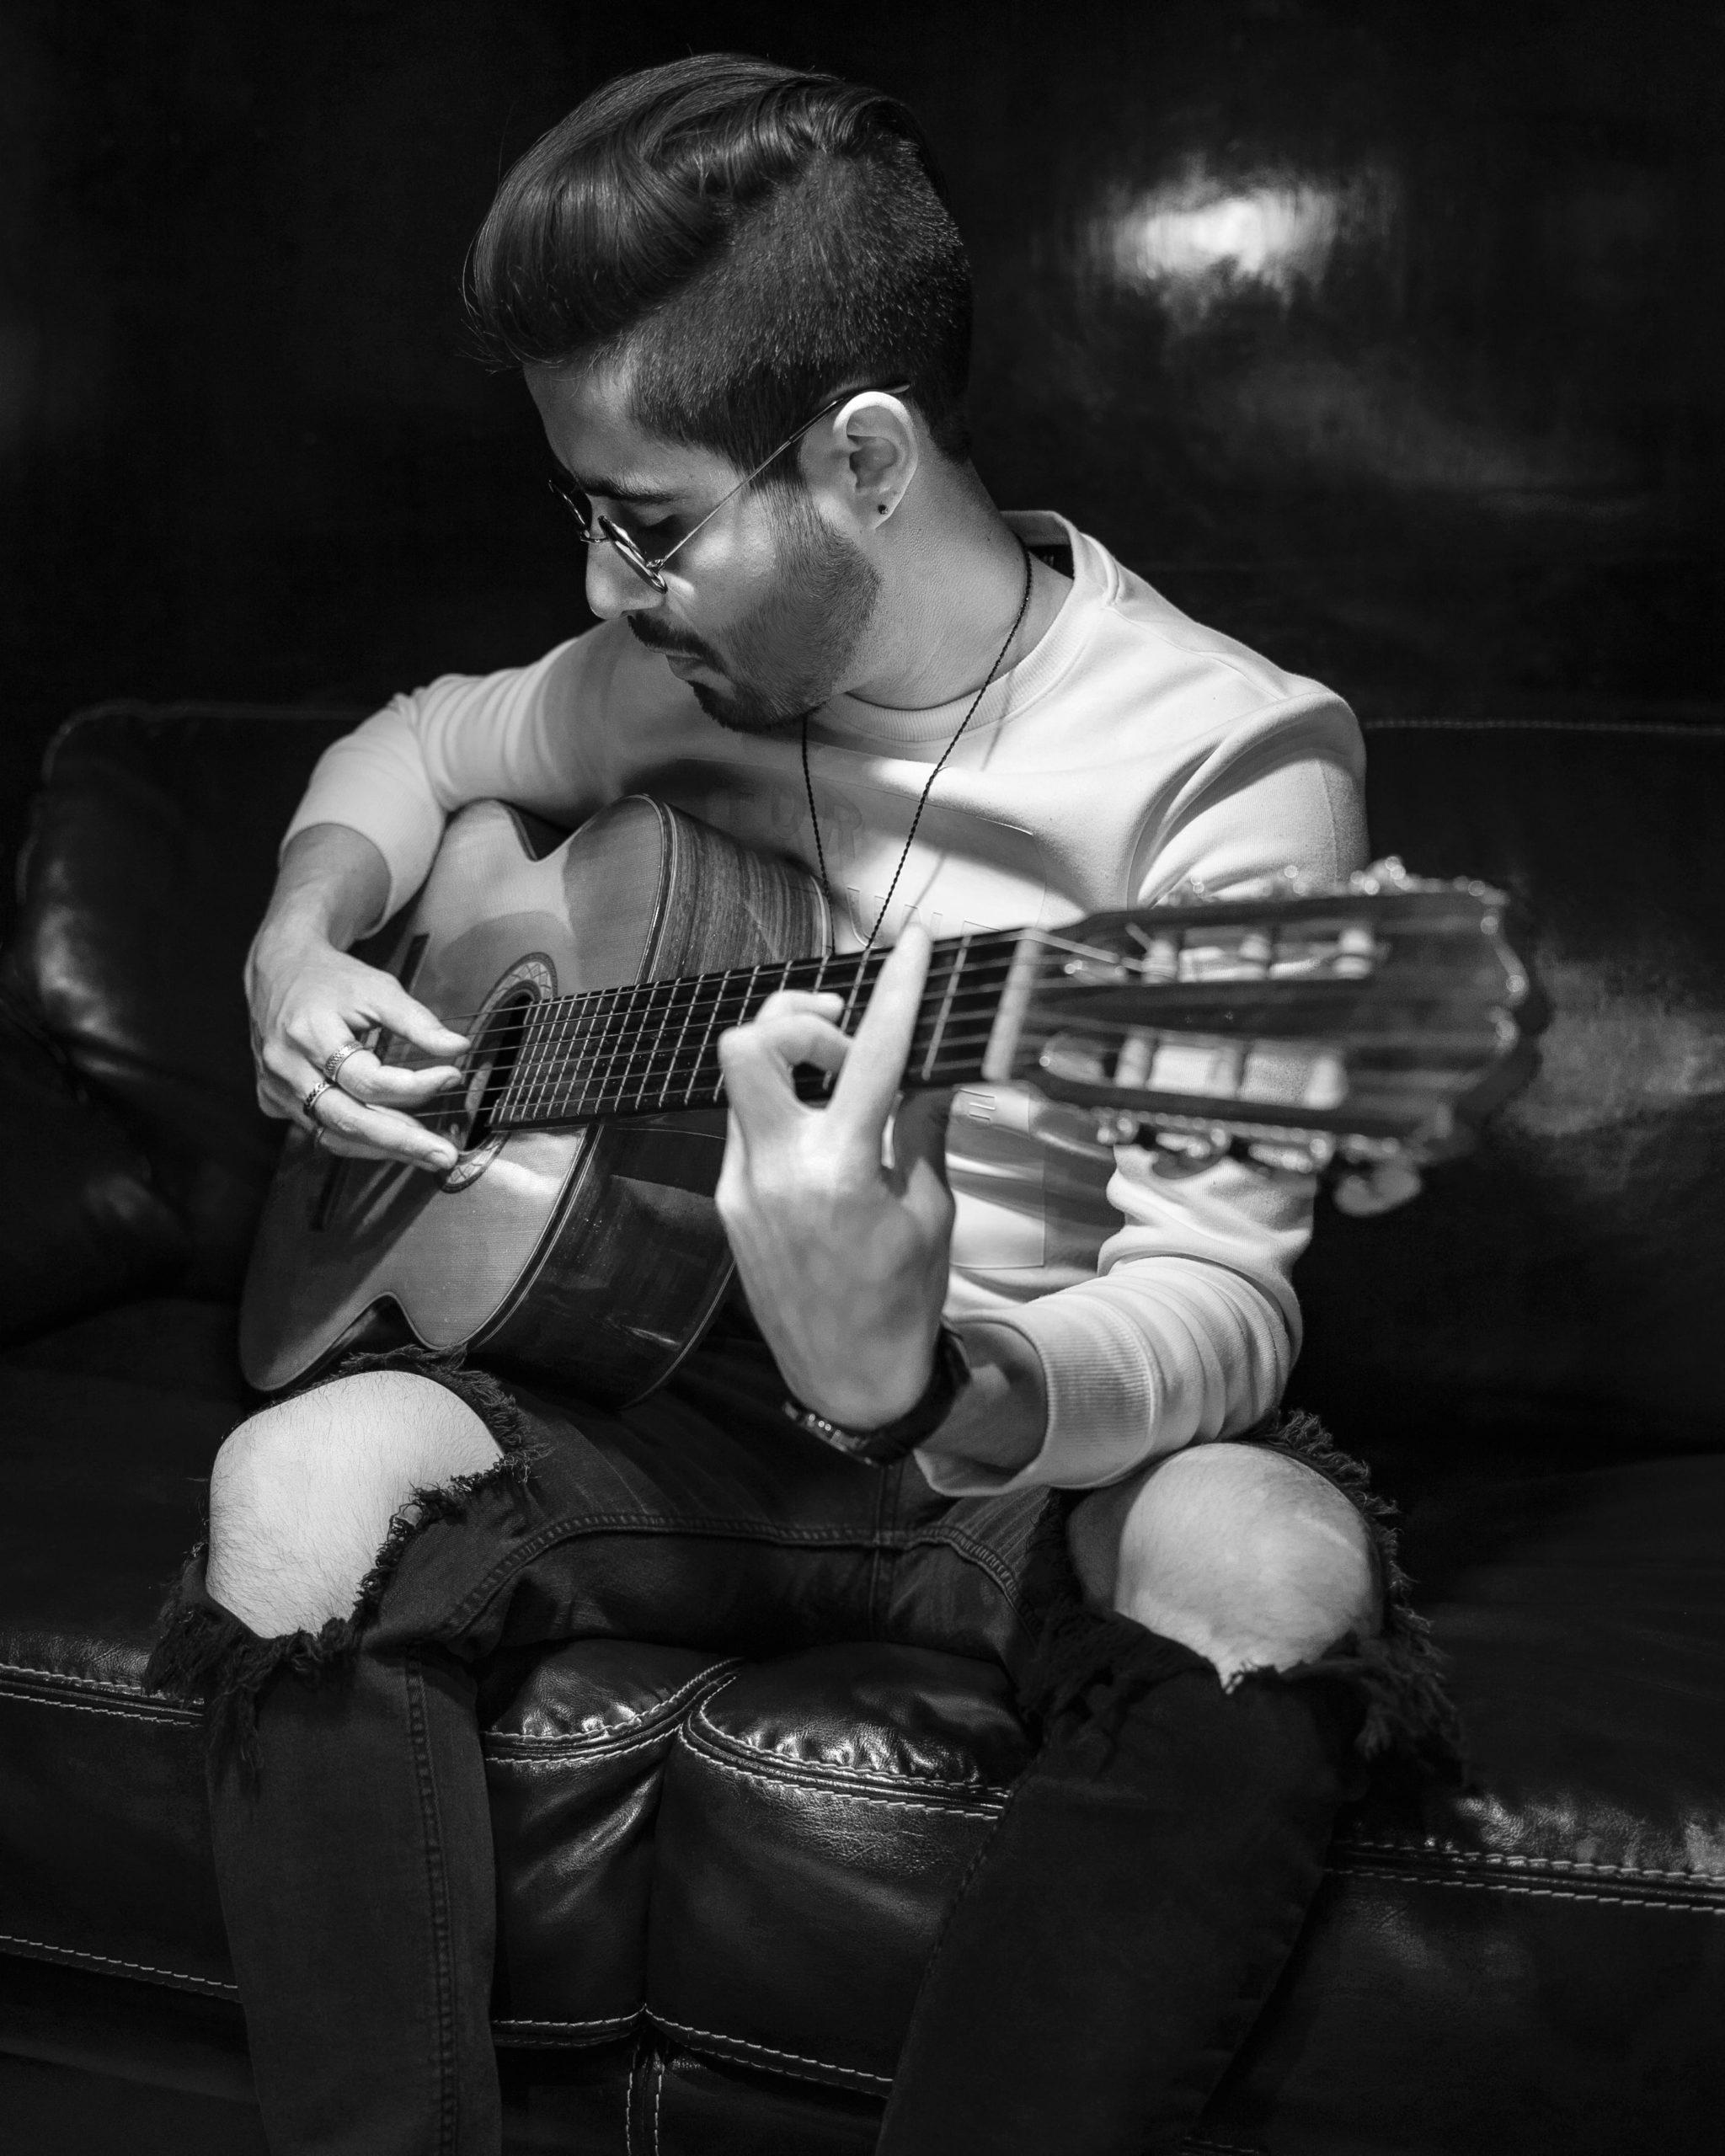 Foto-2-Sebastian-Castro-Musica-Musica-Sebastian_Castro-Pop-Urbana-Mexico-2020-Influencer-Artista-Cantante-Singer-min